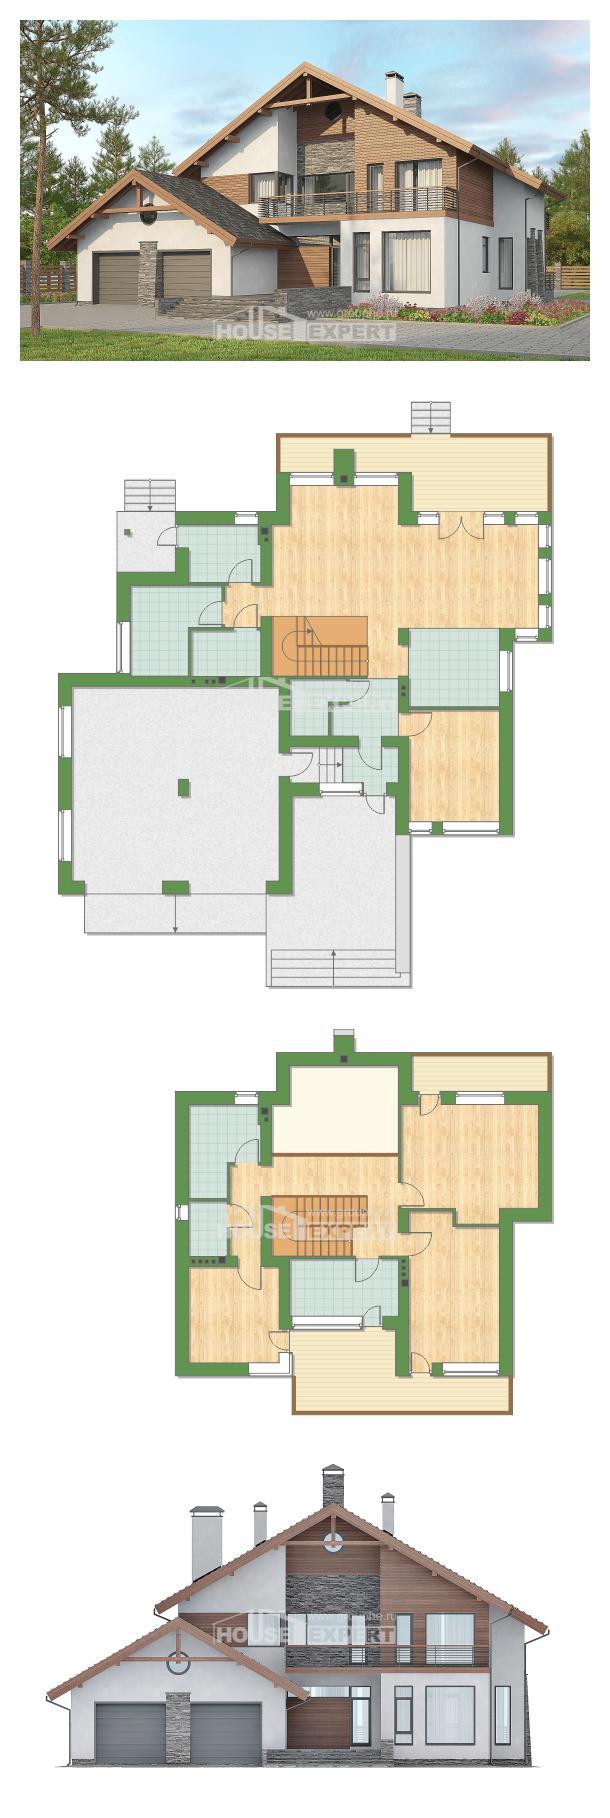 Projekt domu 270-003-L | House Expert